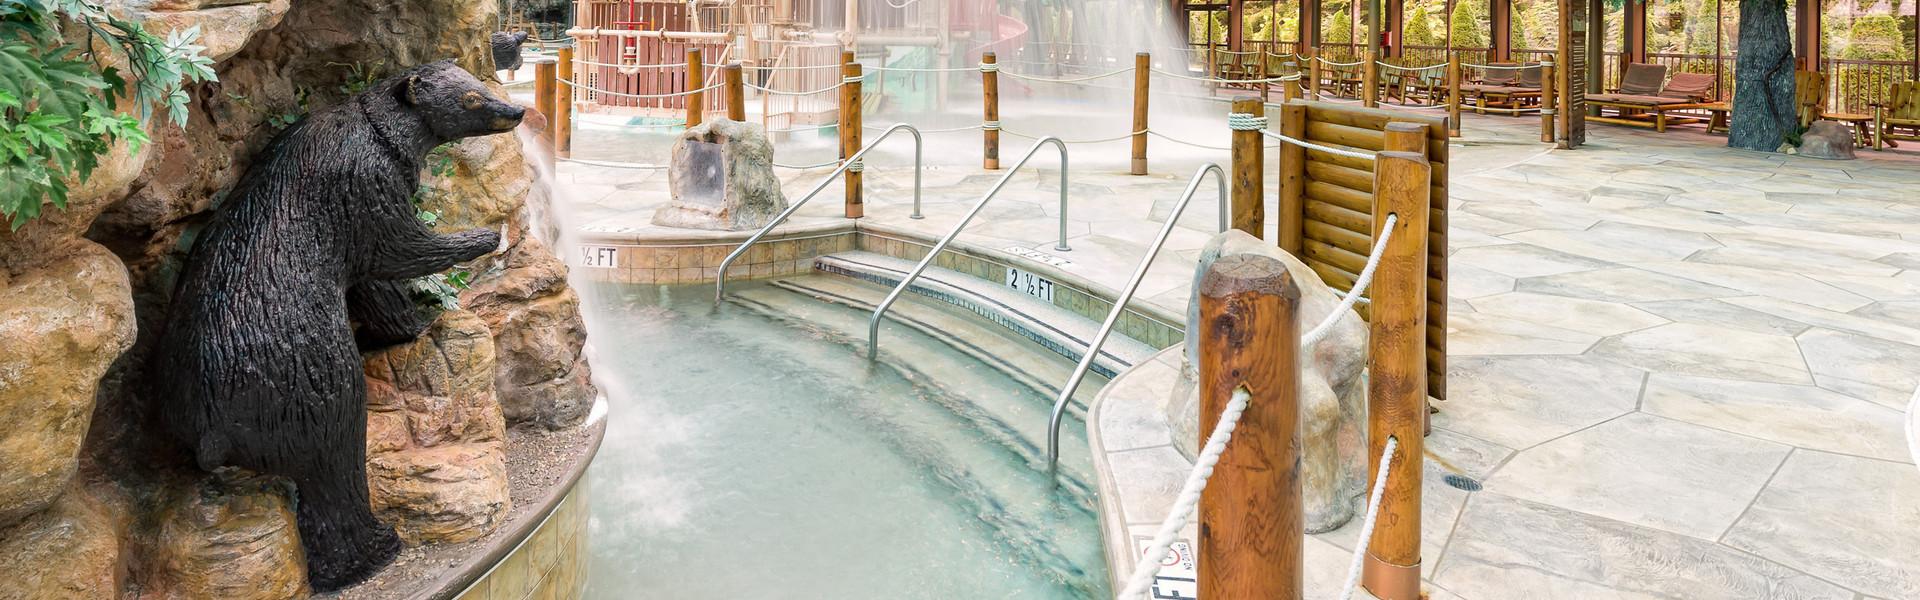 Indoor Gatlinburg Waterpark near the Smoky Mountains | Wild Bear Falls